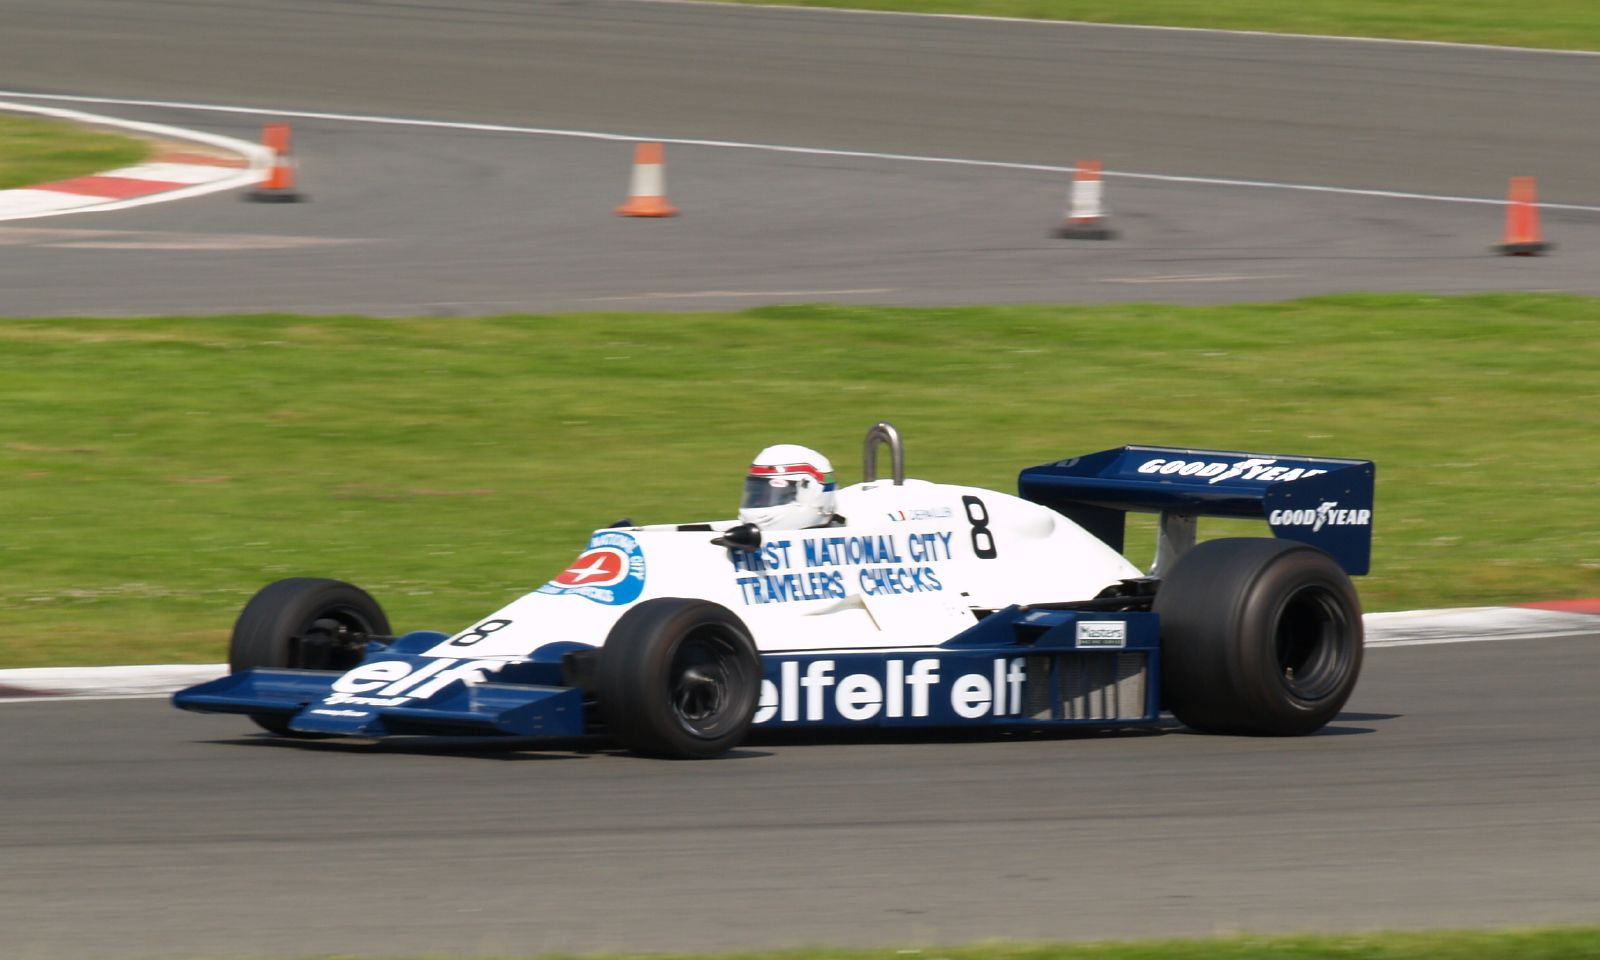 Tyrrell 008 - Wikipedia